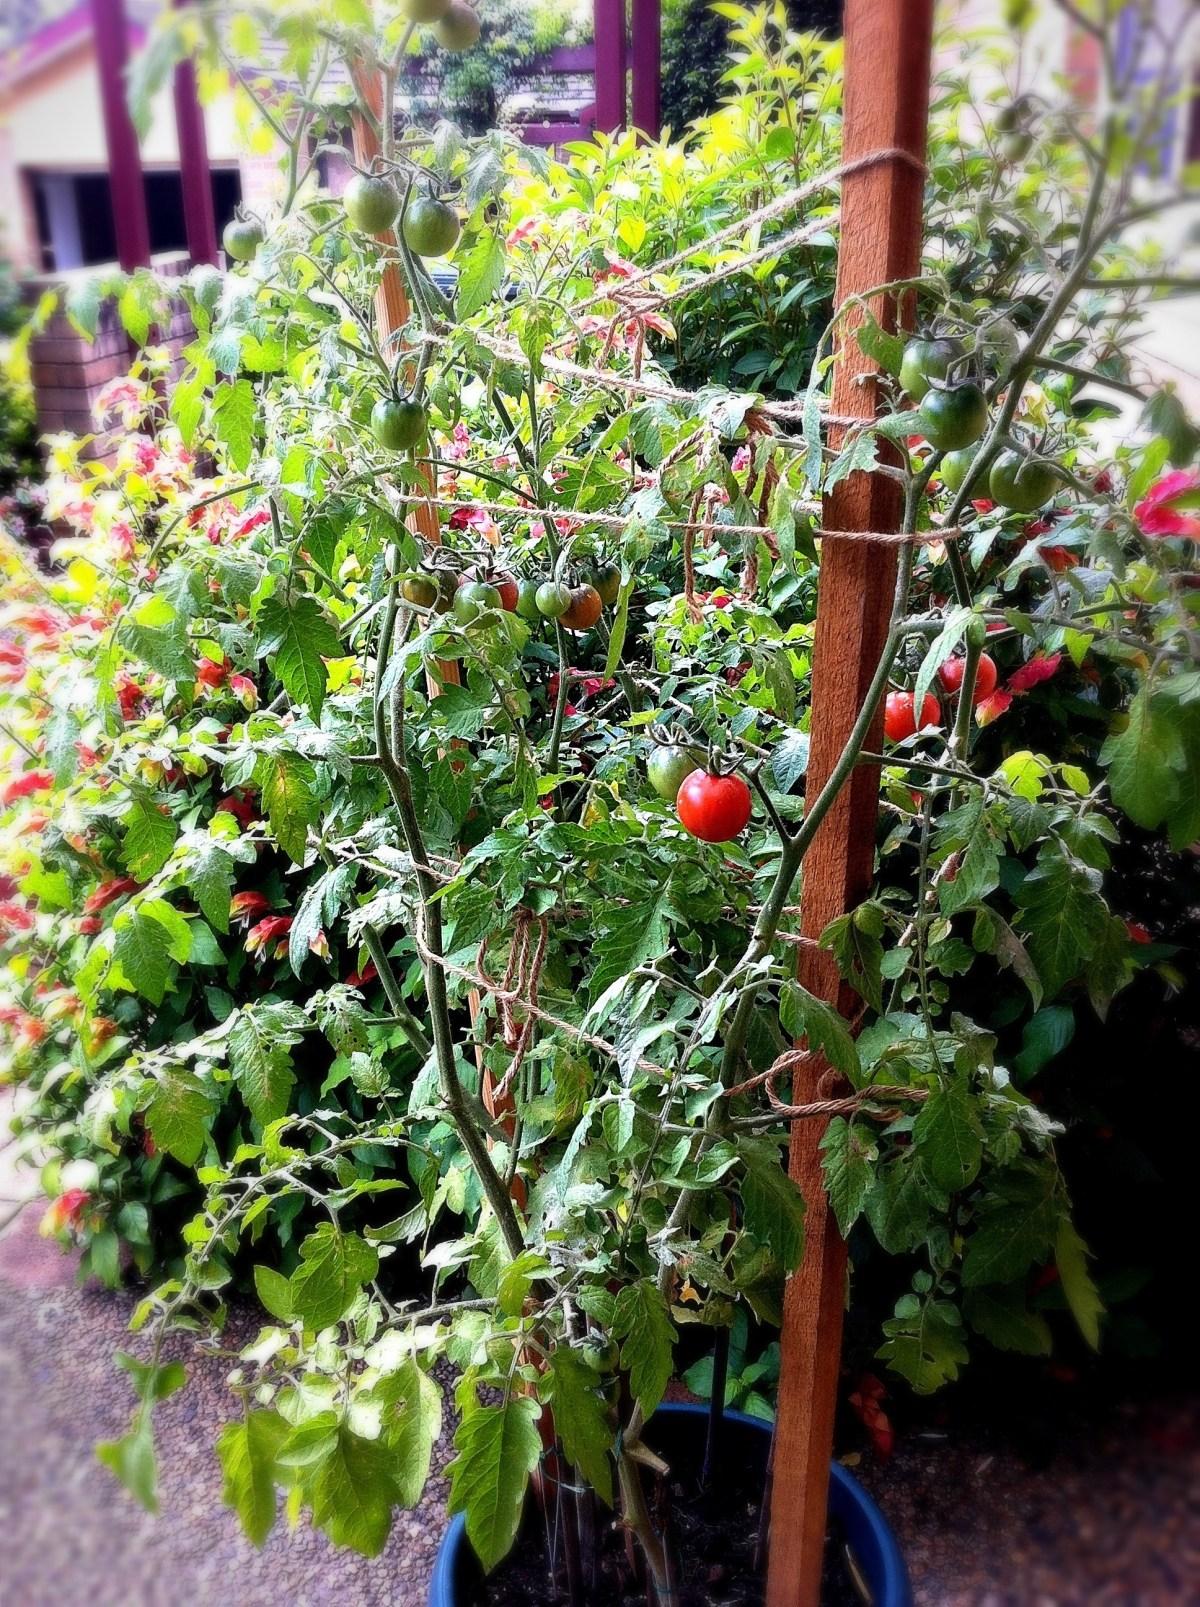 006: Tomato tree